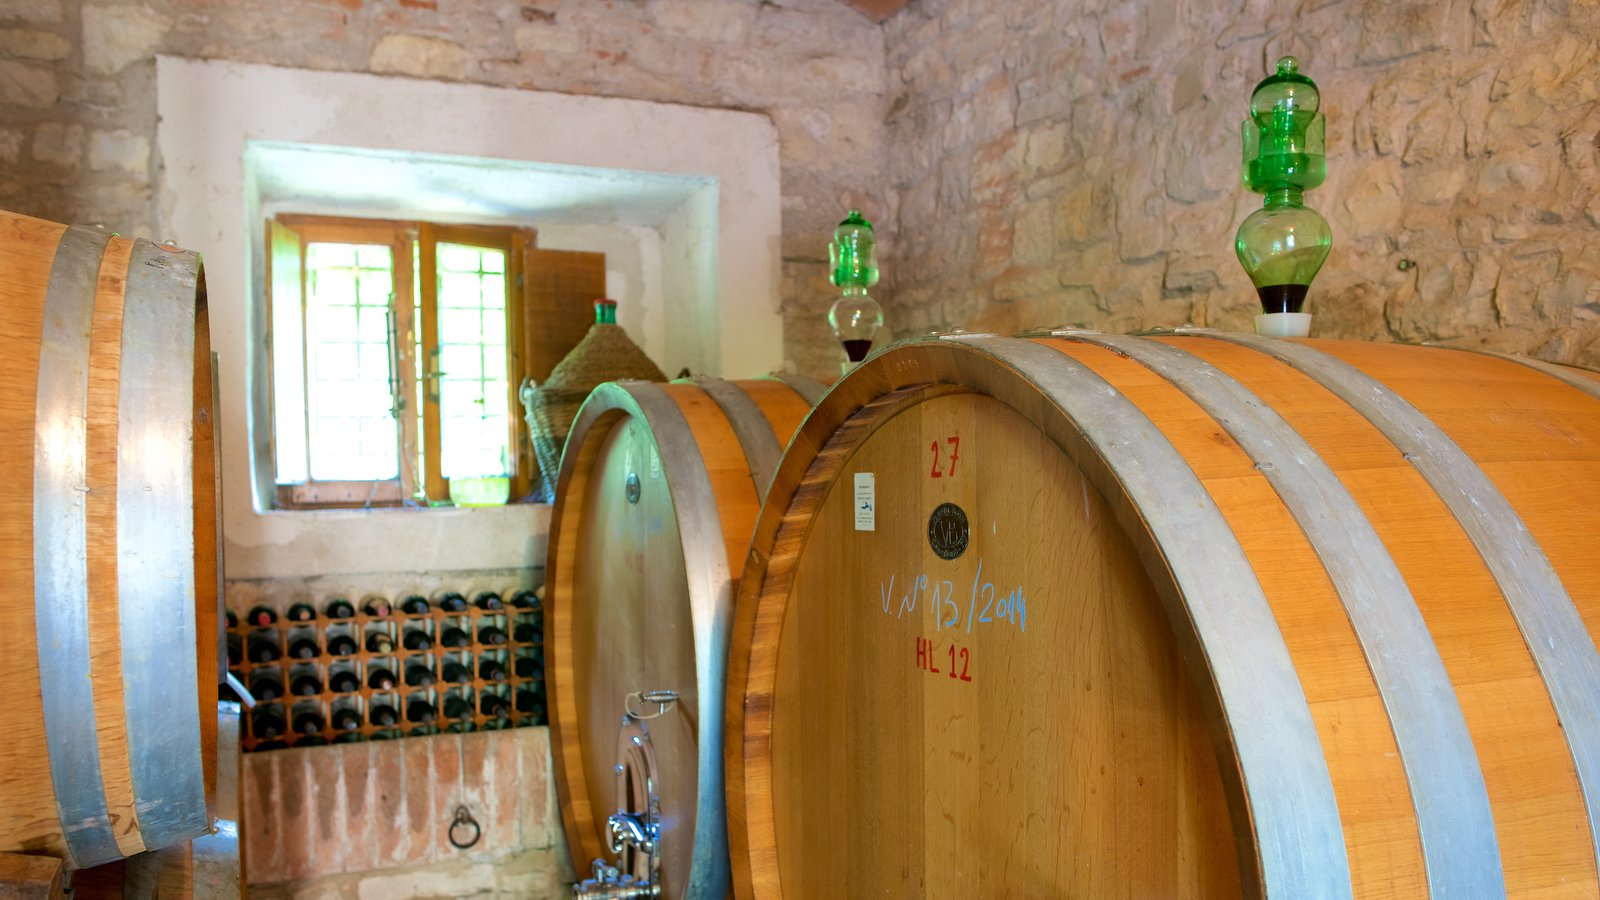 Castellina in Chianti featuring interior views